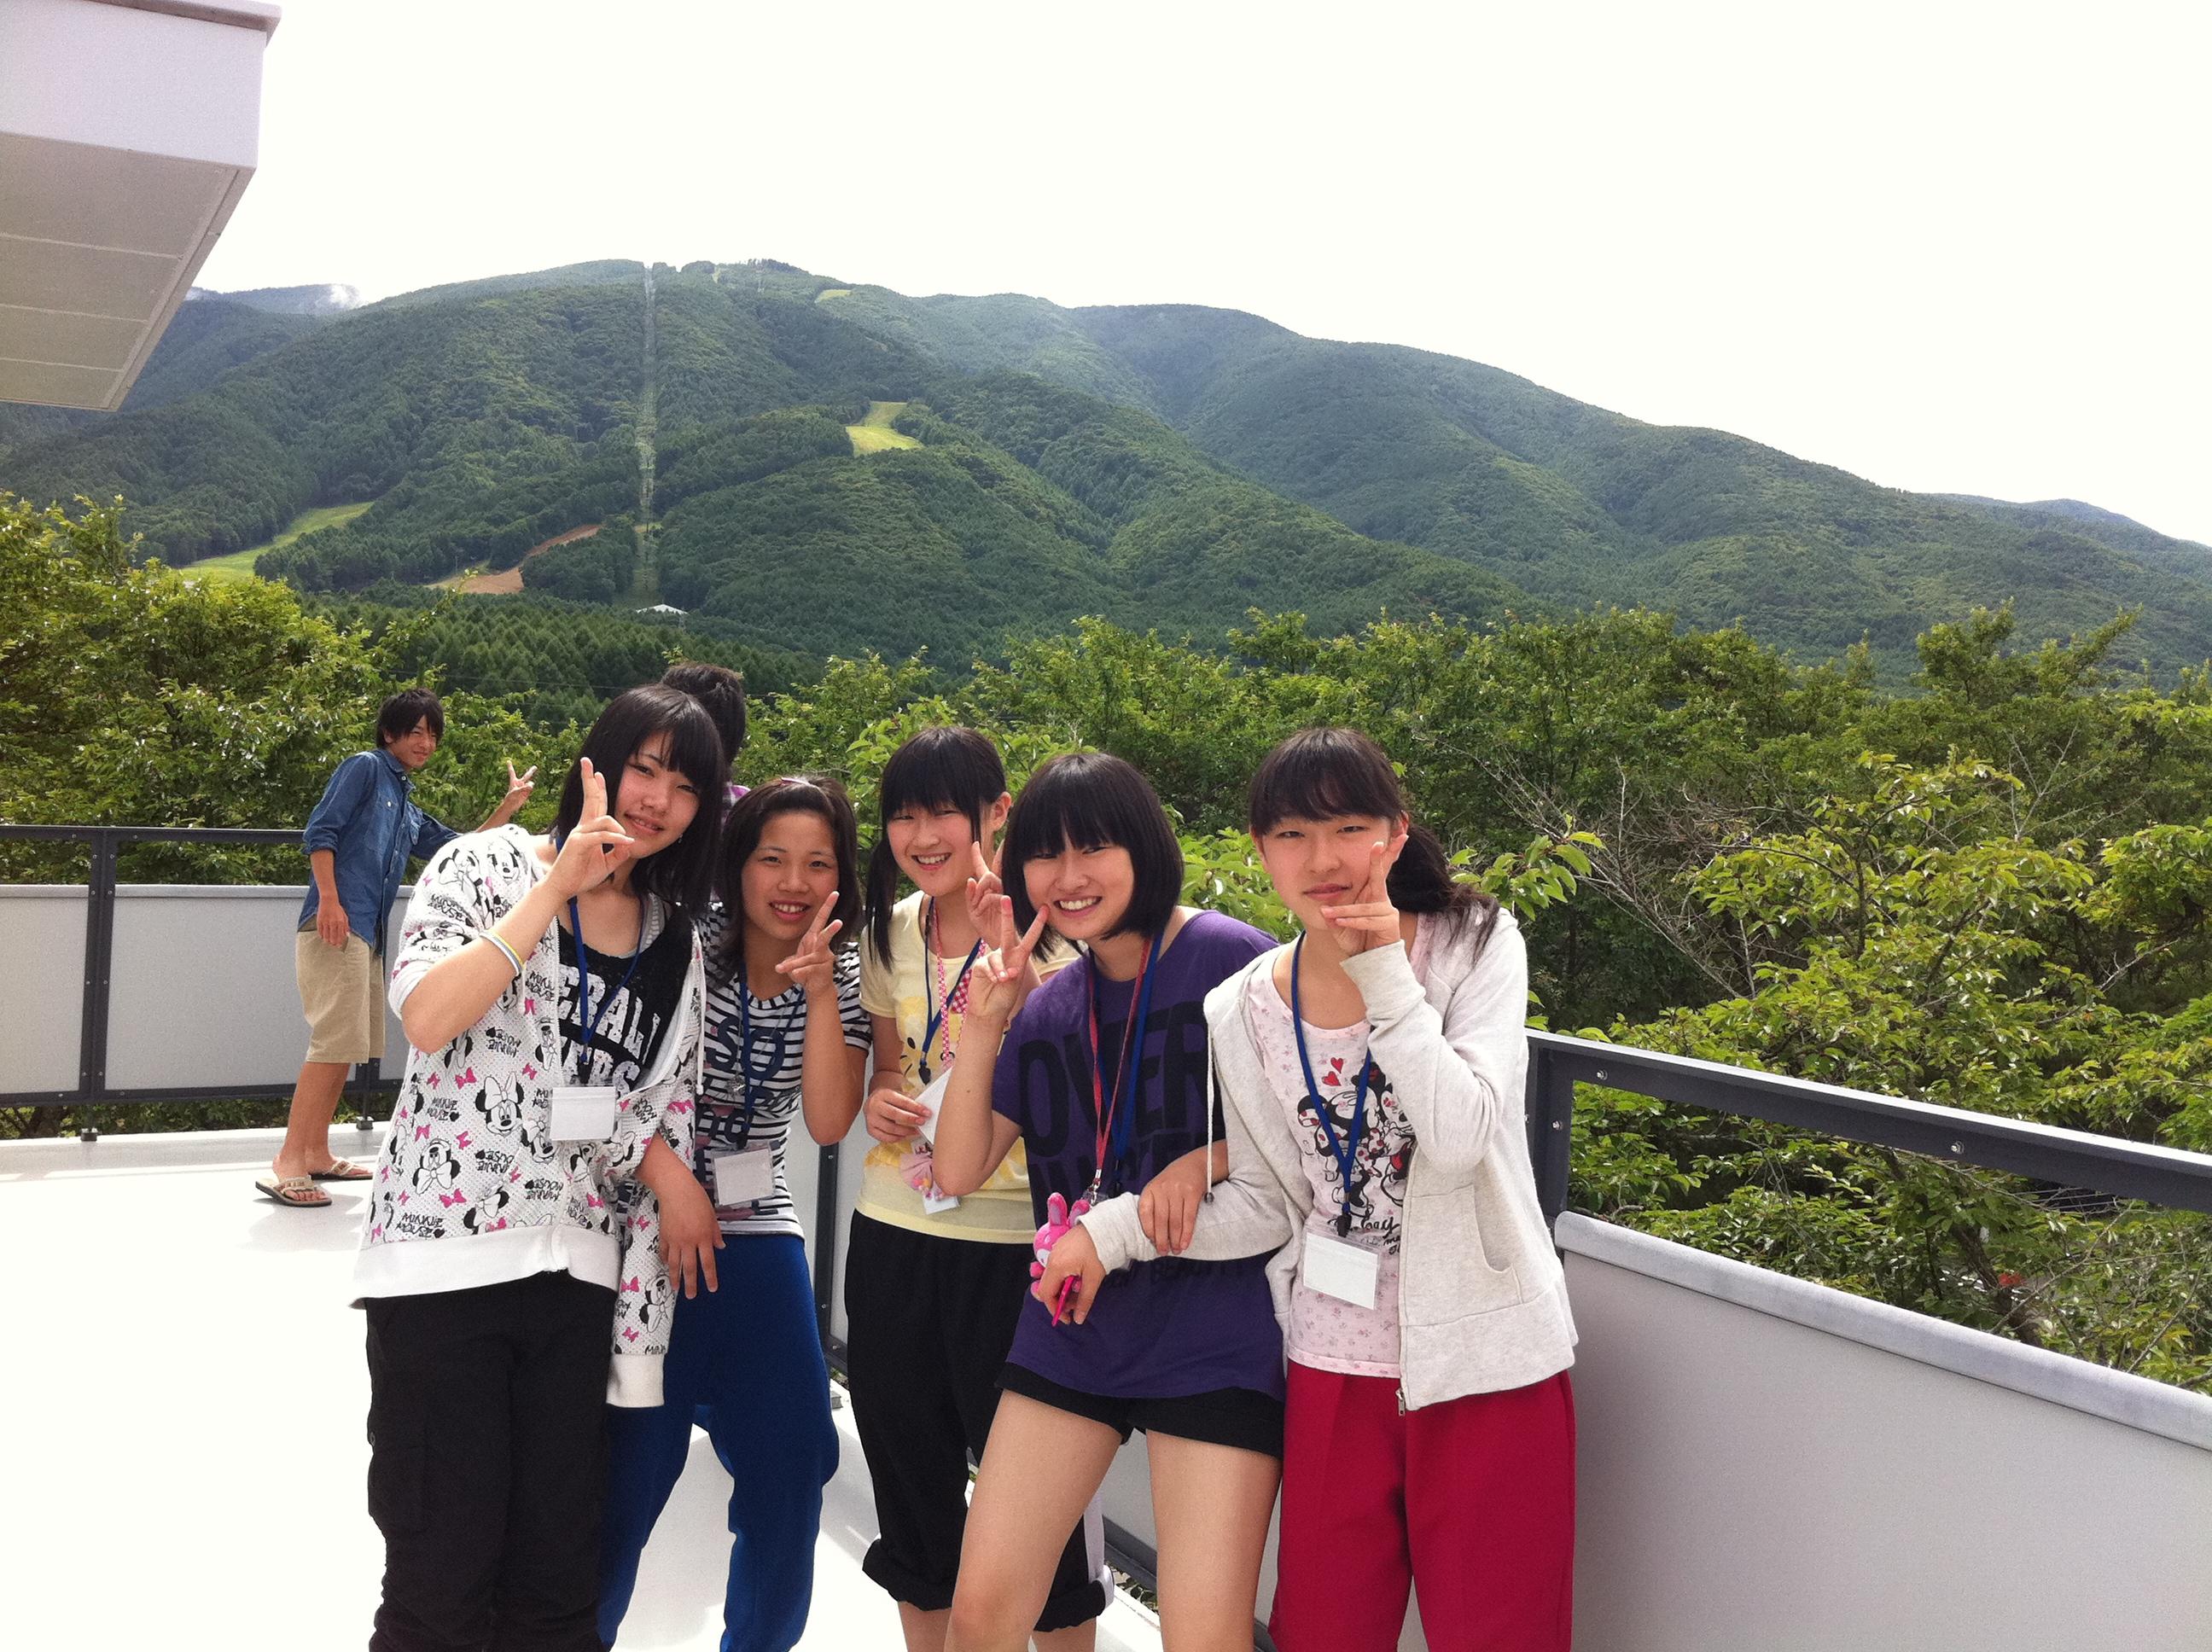 http://www.kodomonotsubasa.com/2011/07/28/0727kagome04.JPG